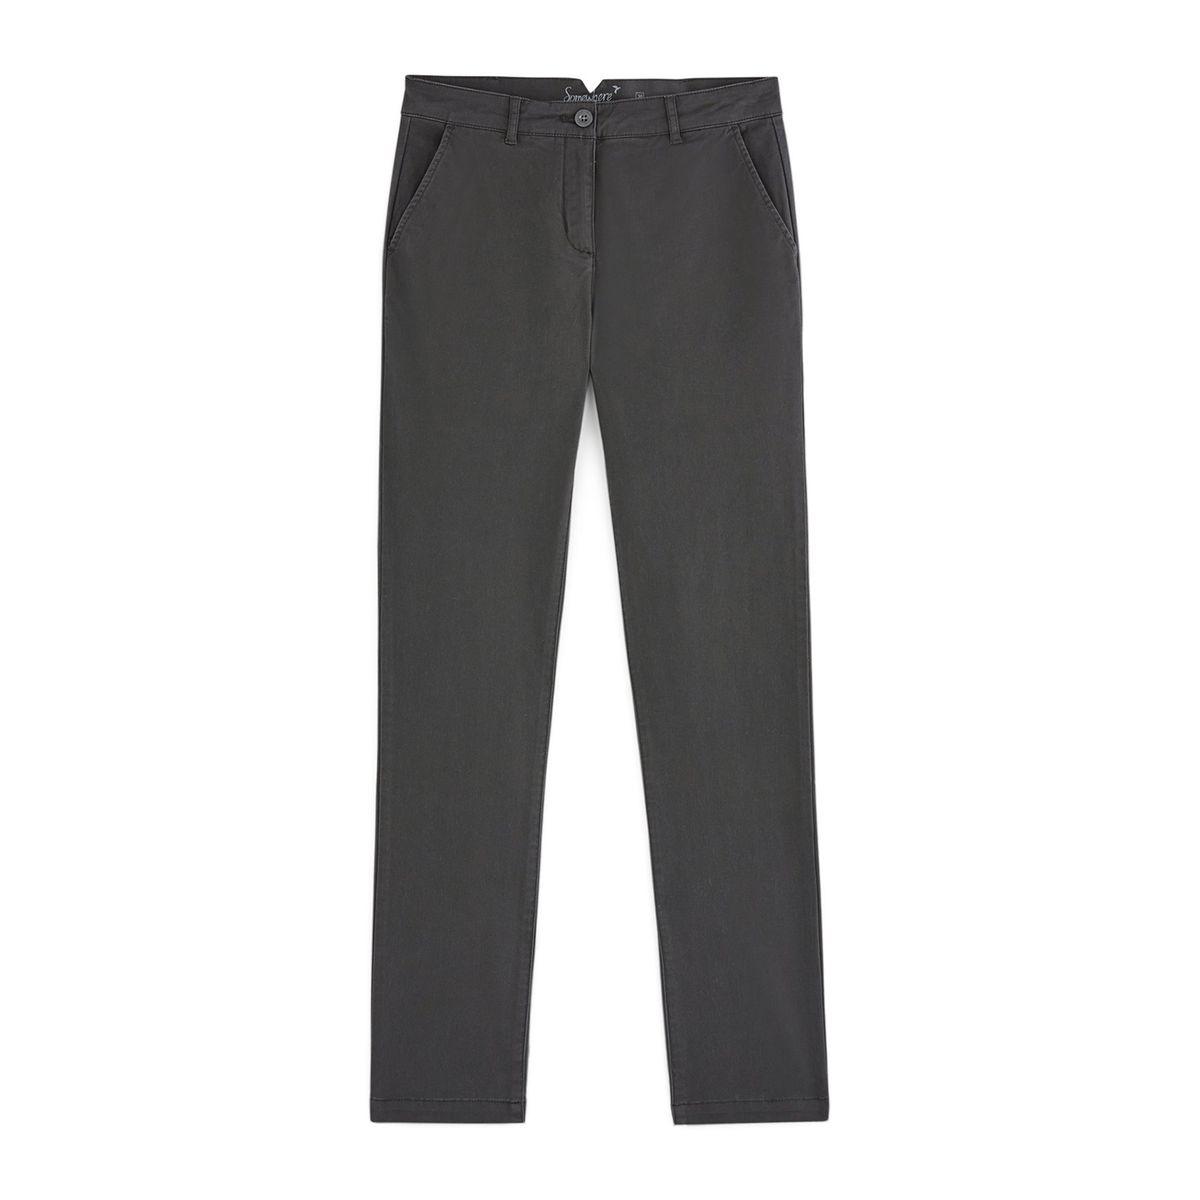 pantalon femme twill stretch 861454517344